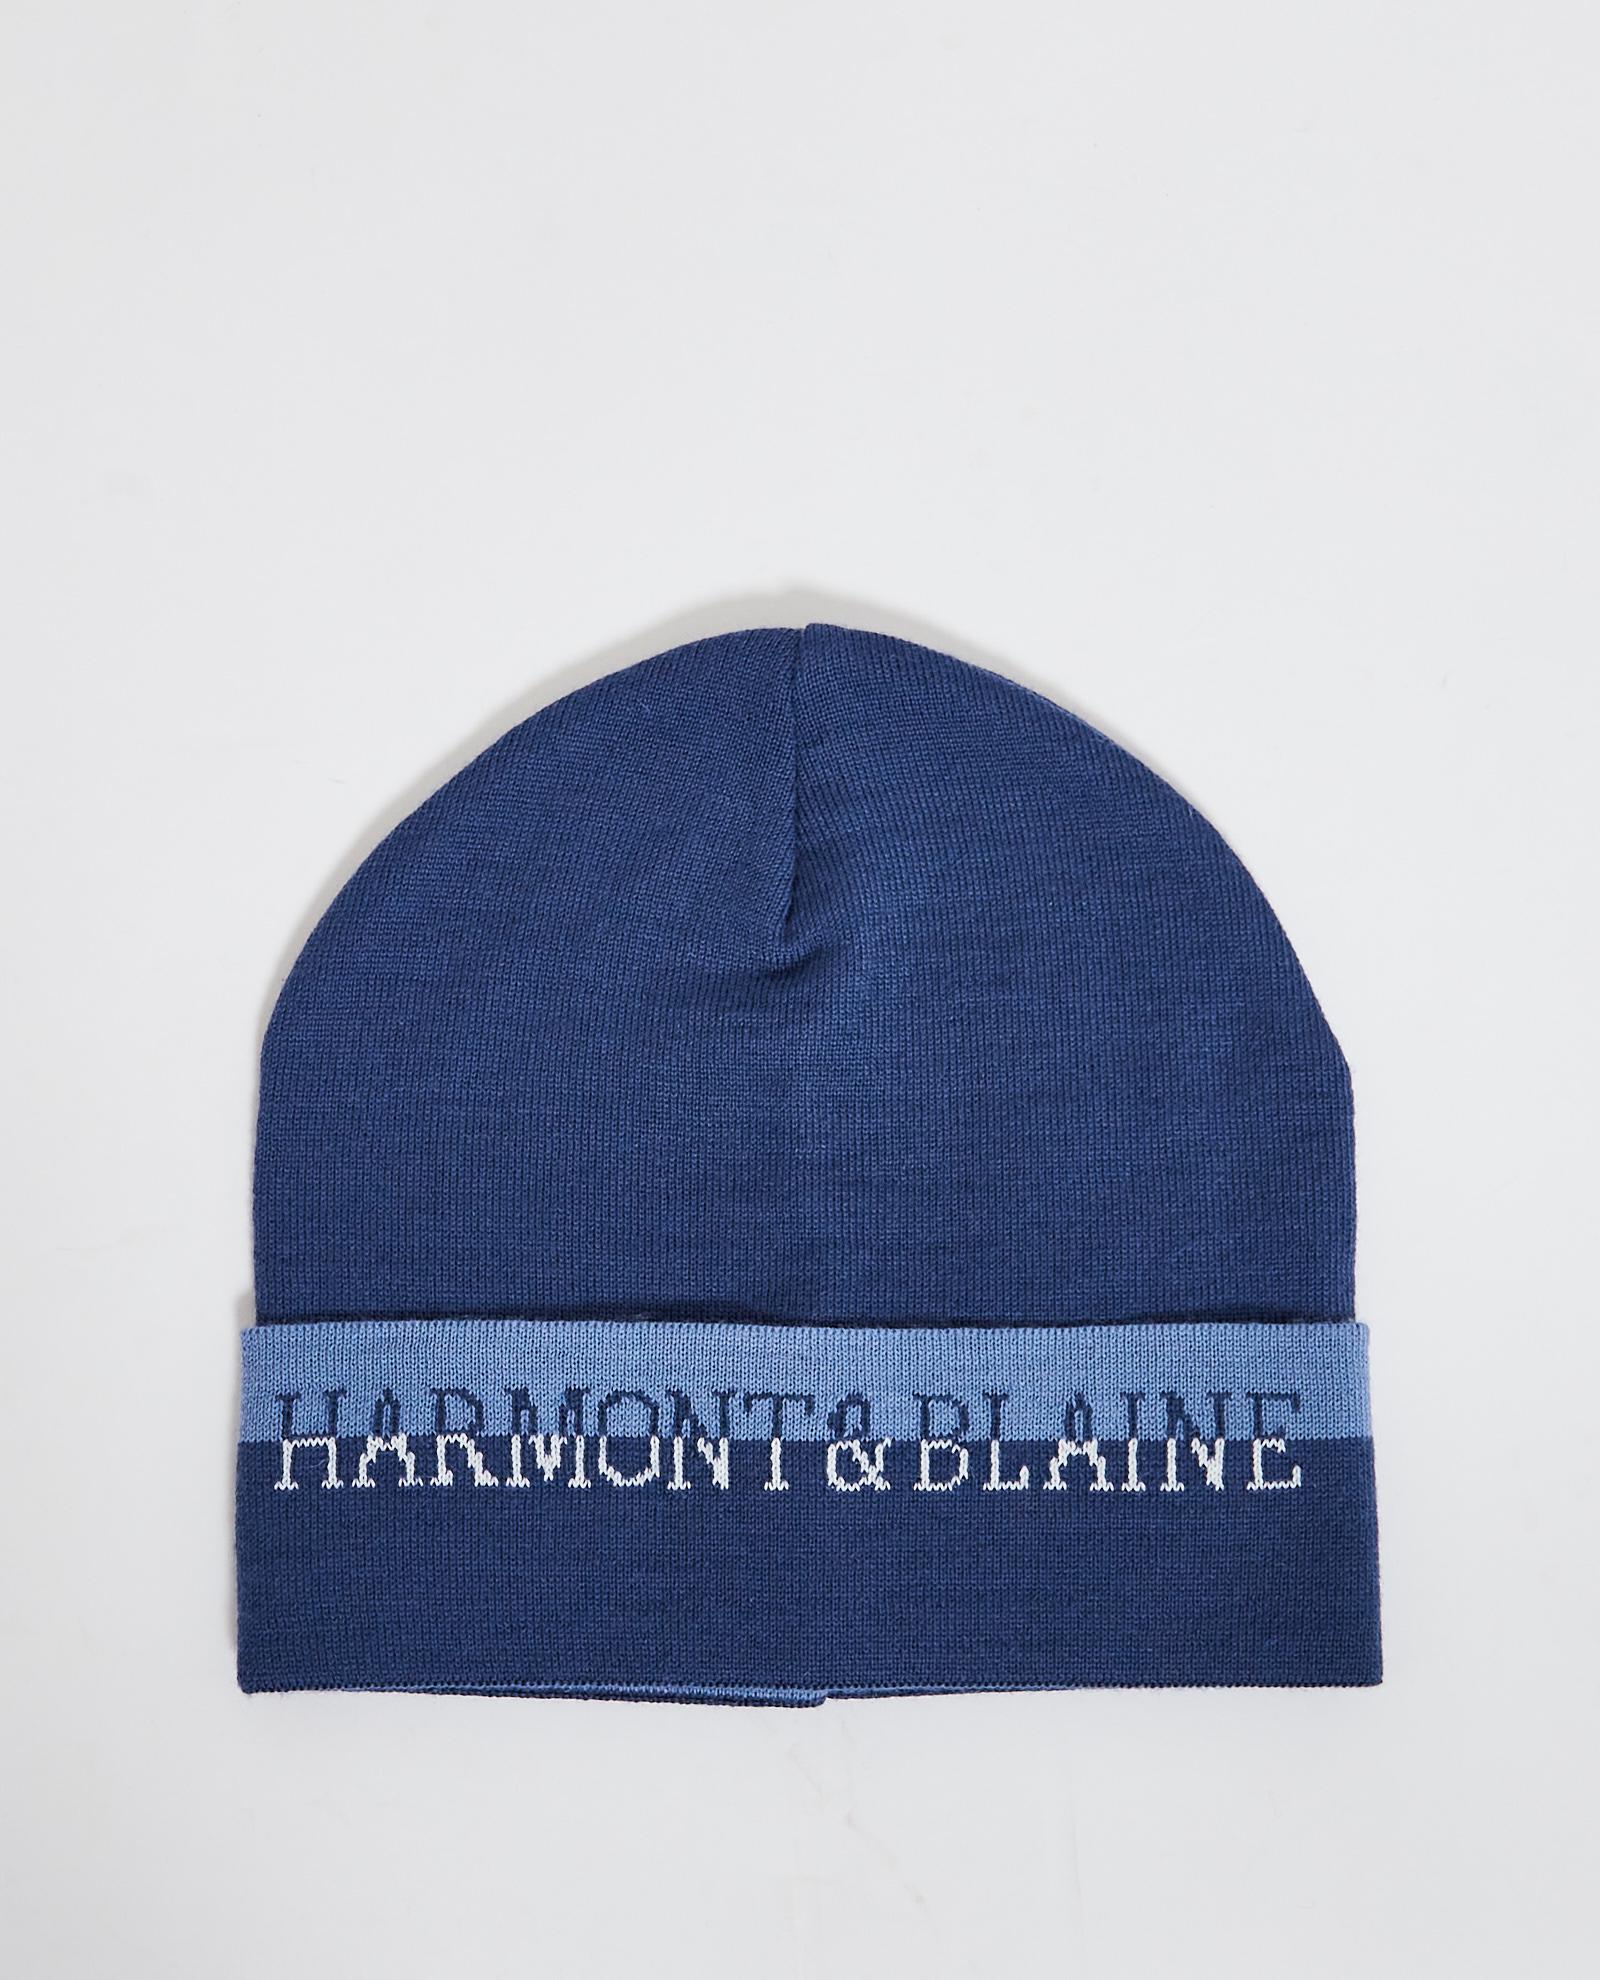 Cappello in lana Harmont and blaine HARMONT & BLAINE | Cappello | N0G068030798856